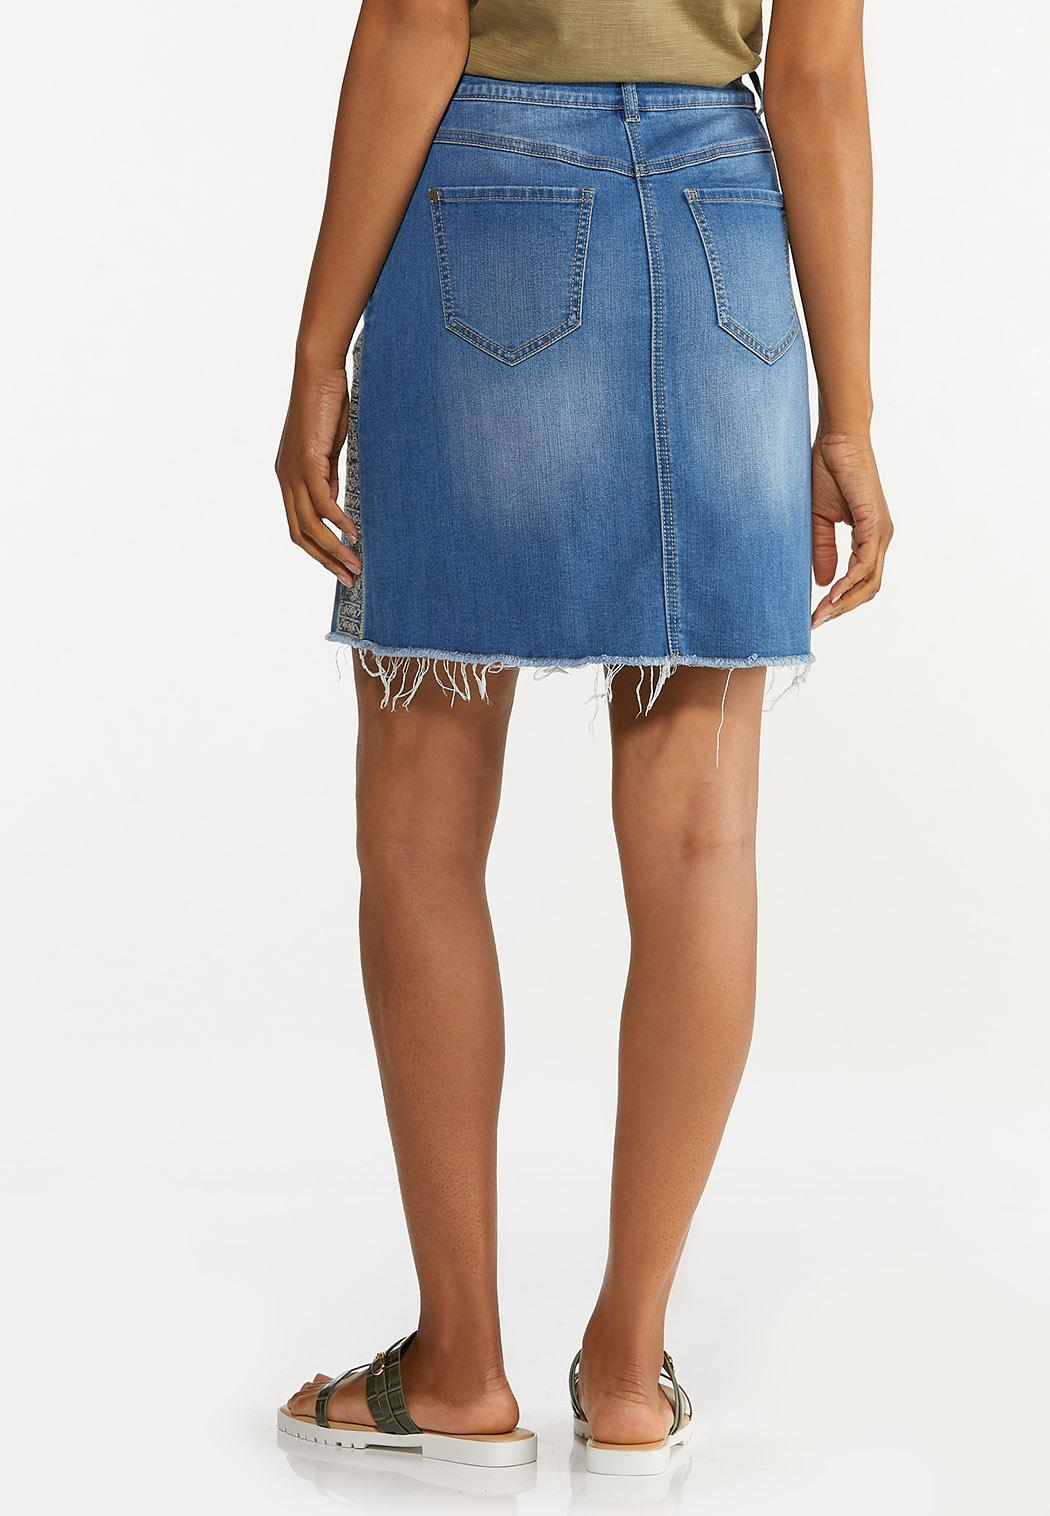 Embroidered Denim Skirt (Item #44627013)